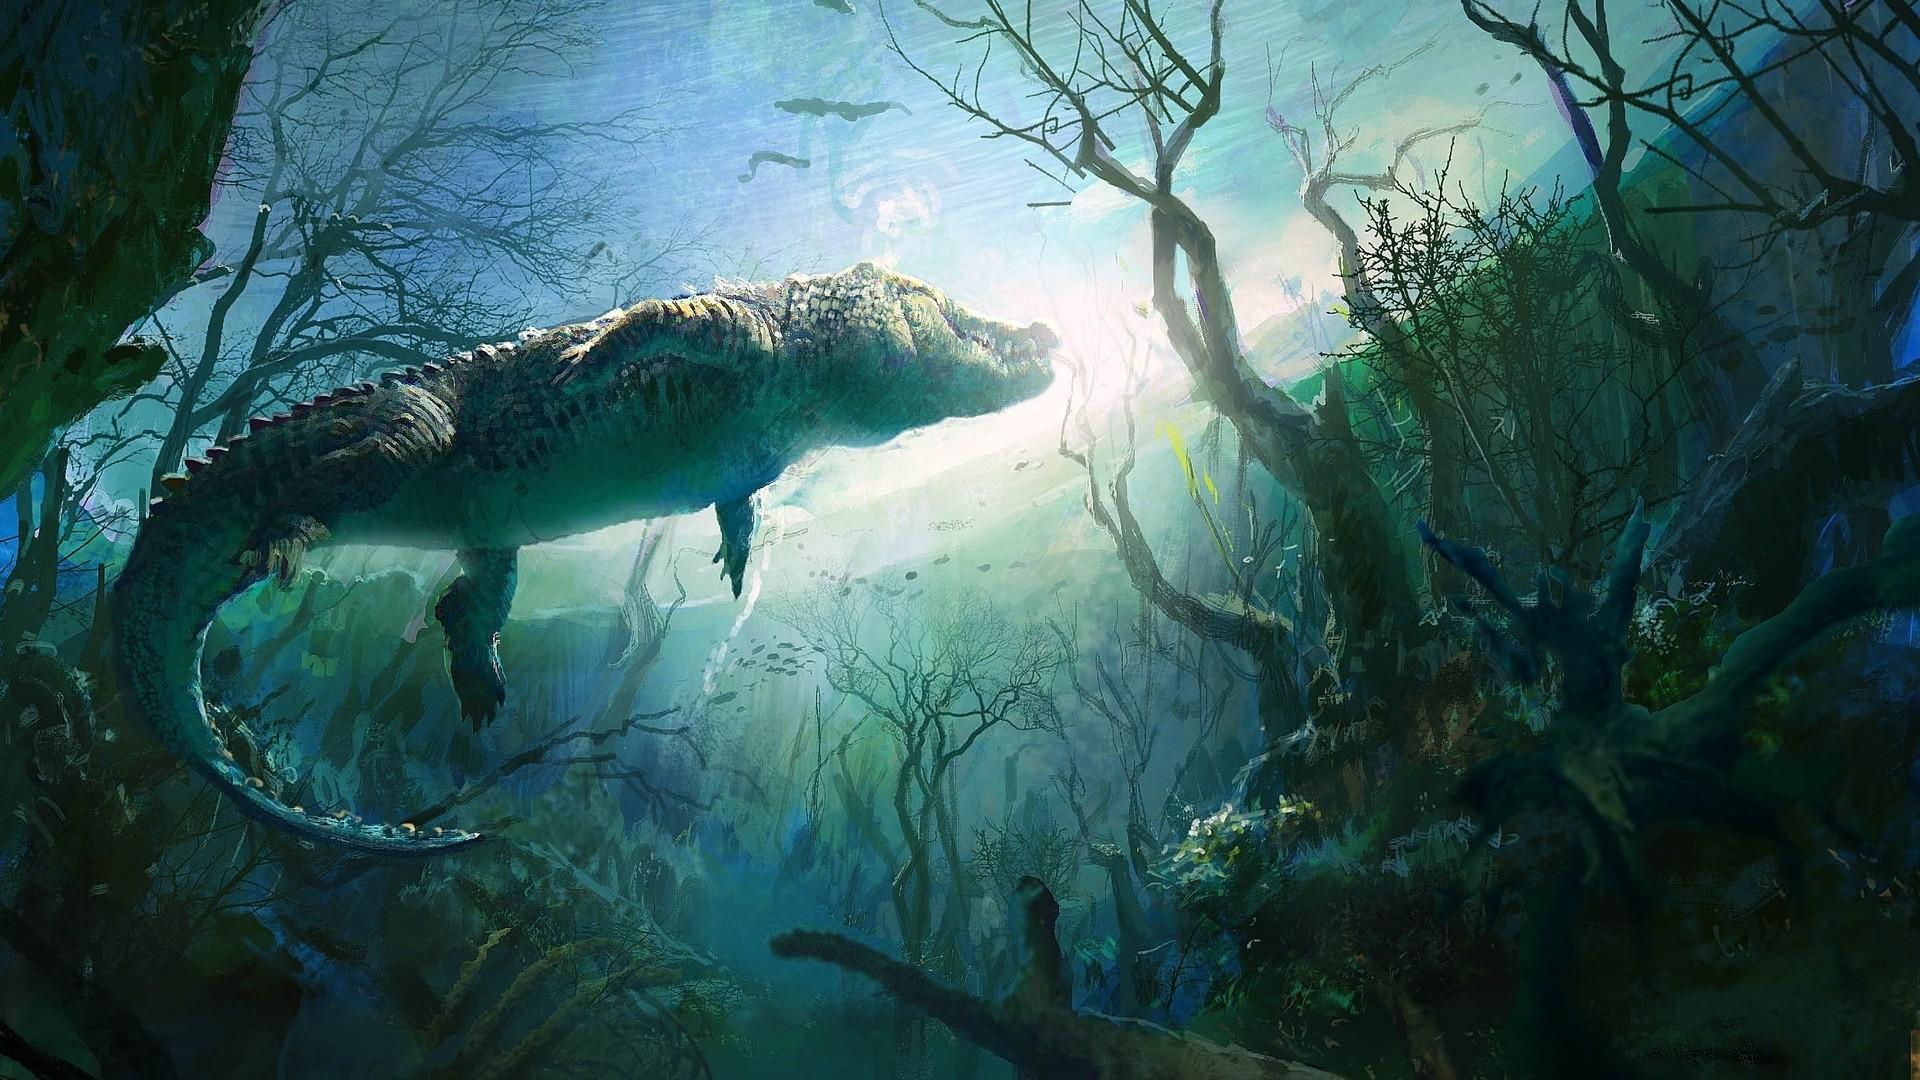 1280x1024 Fall Wallpaper Nature Animals Digital Art Underwater Crocodiles